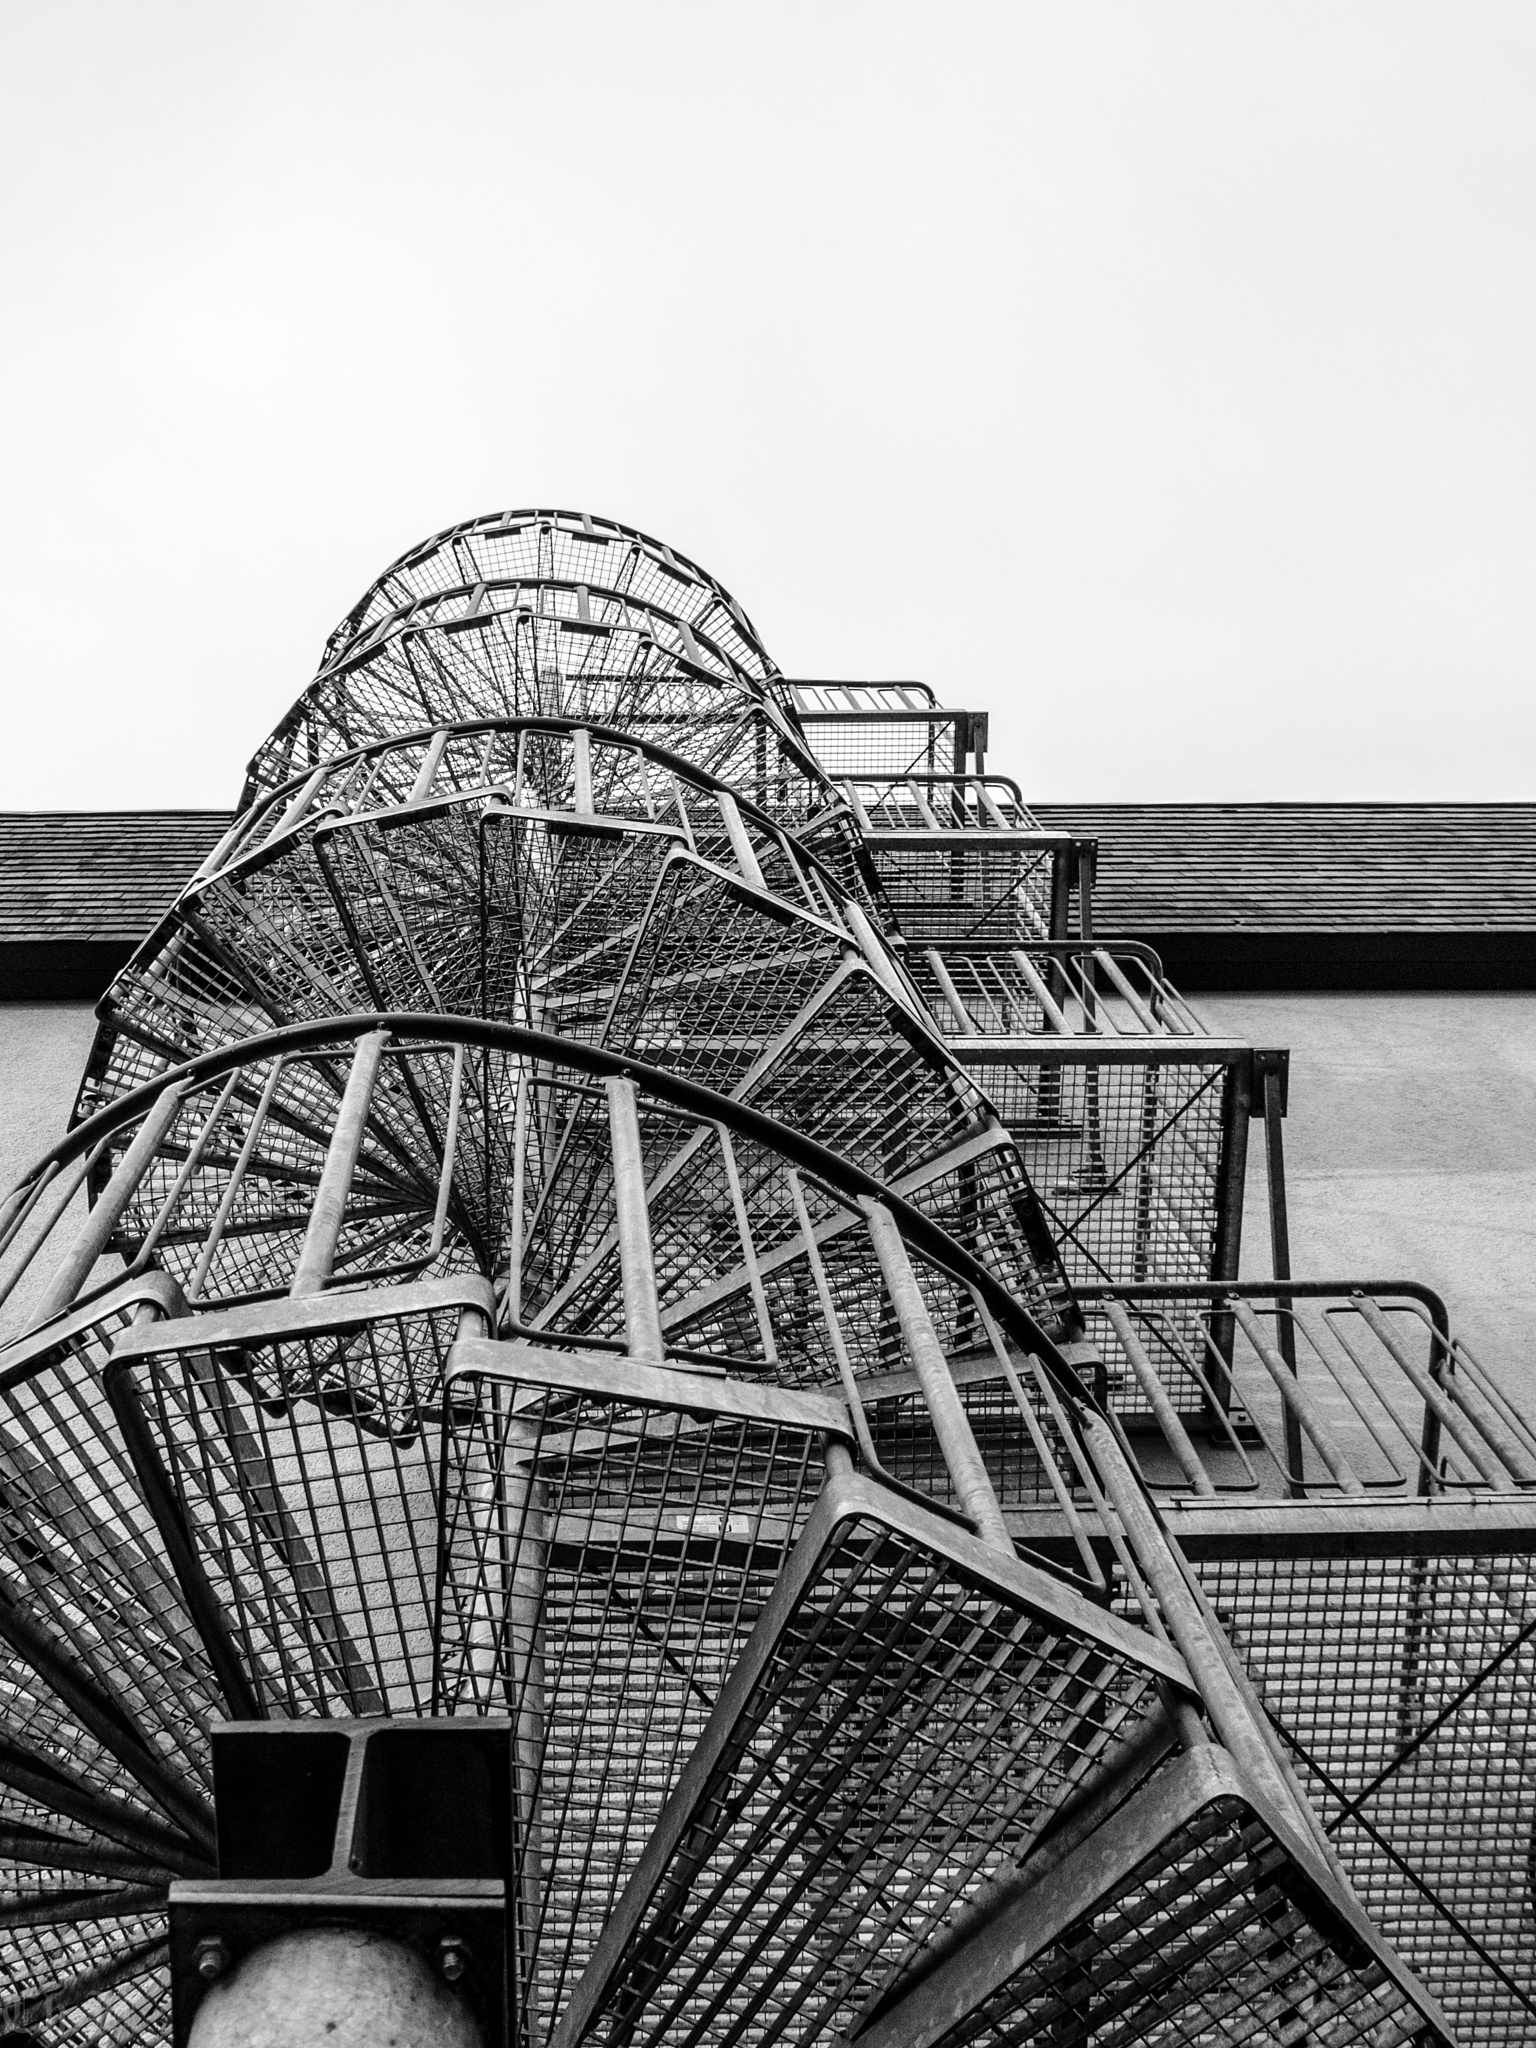 Stuttgart by Chairat Buntaotook